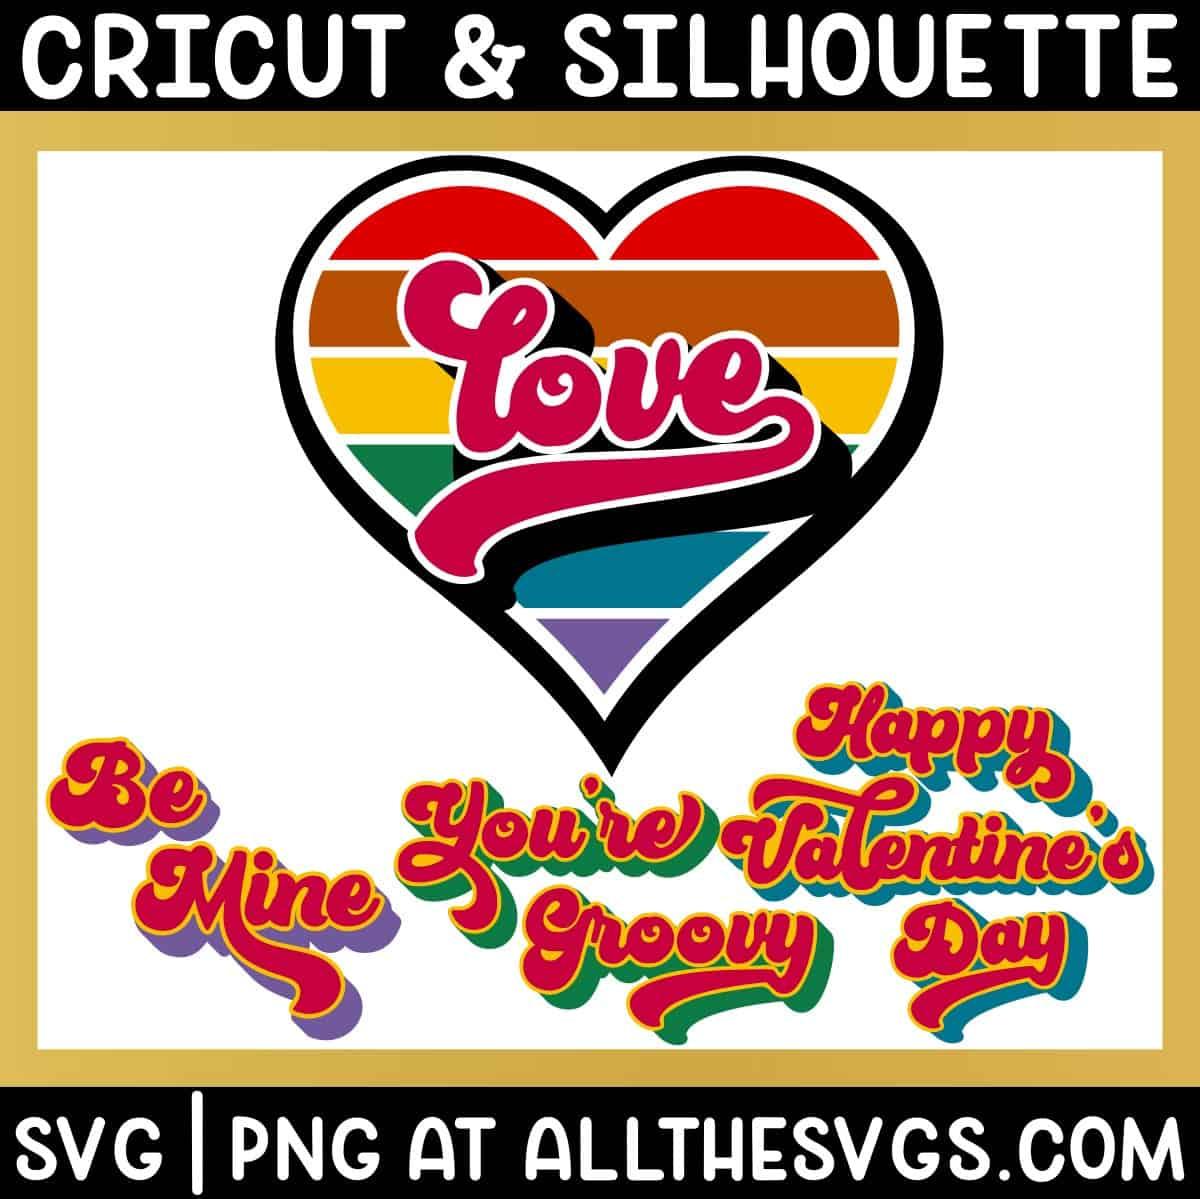 free retro valentine rainbow stripe heart with groovy phrases be mine, happy valentine's day, love